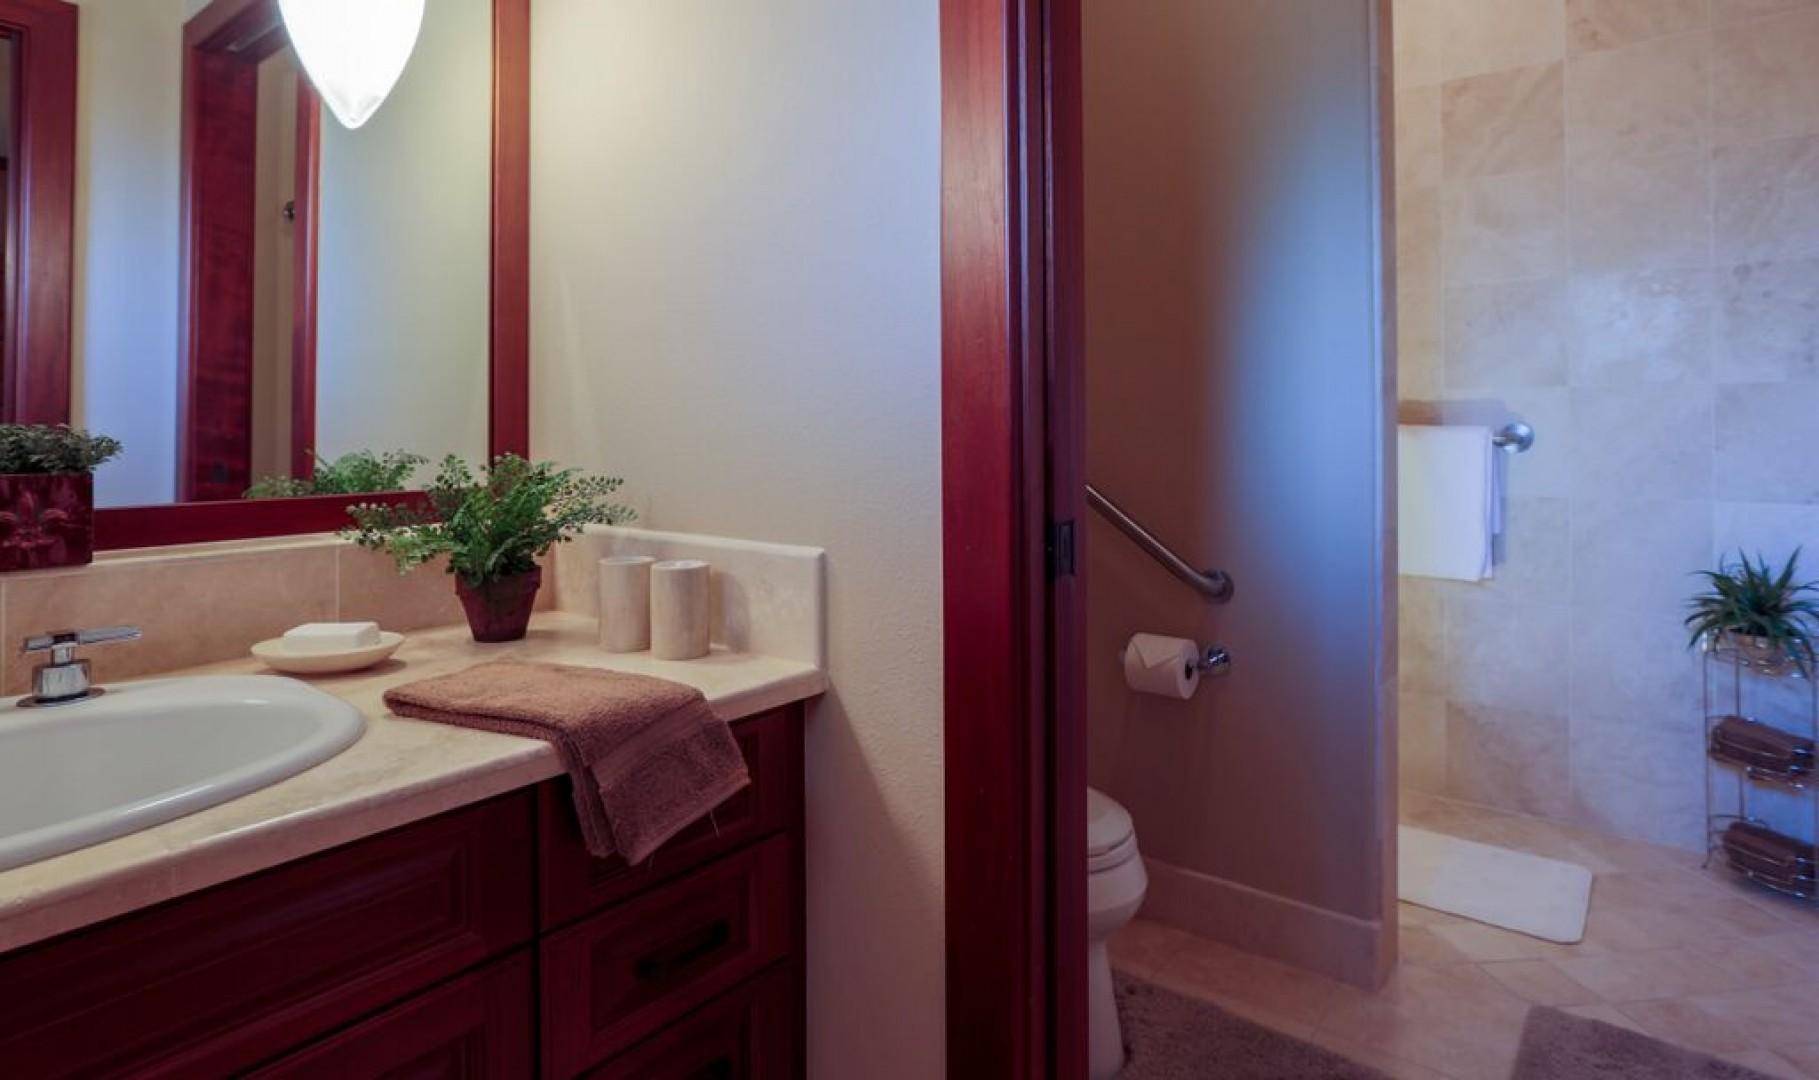 Second master en suite with walk-in shower